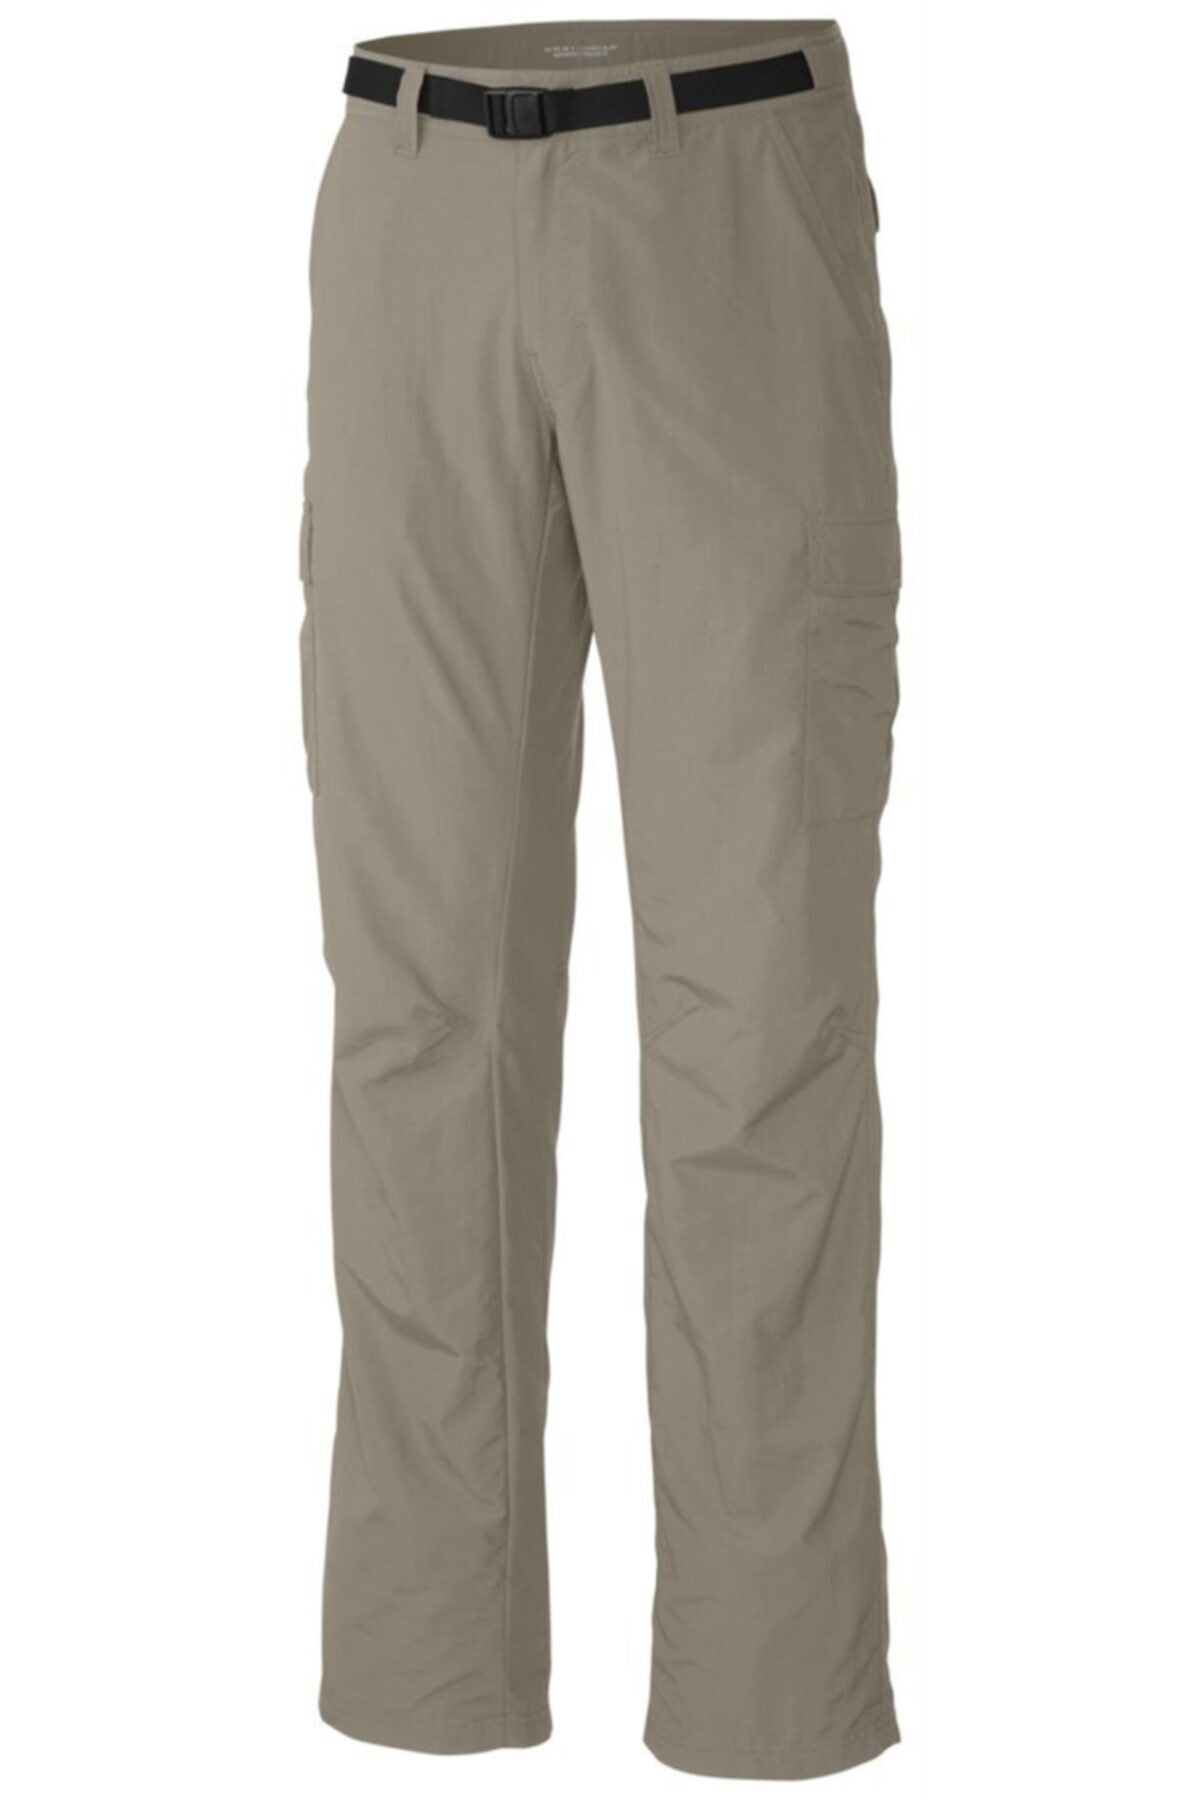 Columbia Am8686-221 Cascades Explorer Erkek Pantolon 1592691221 1